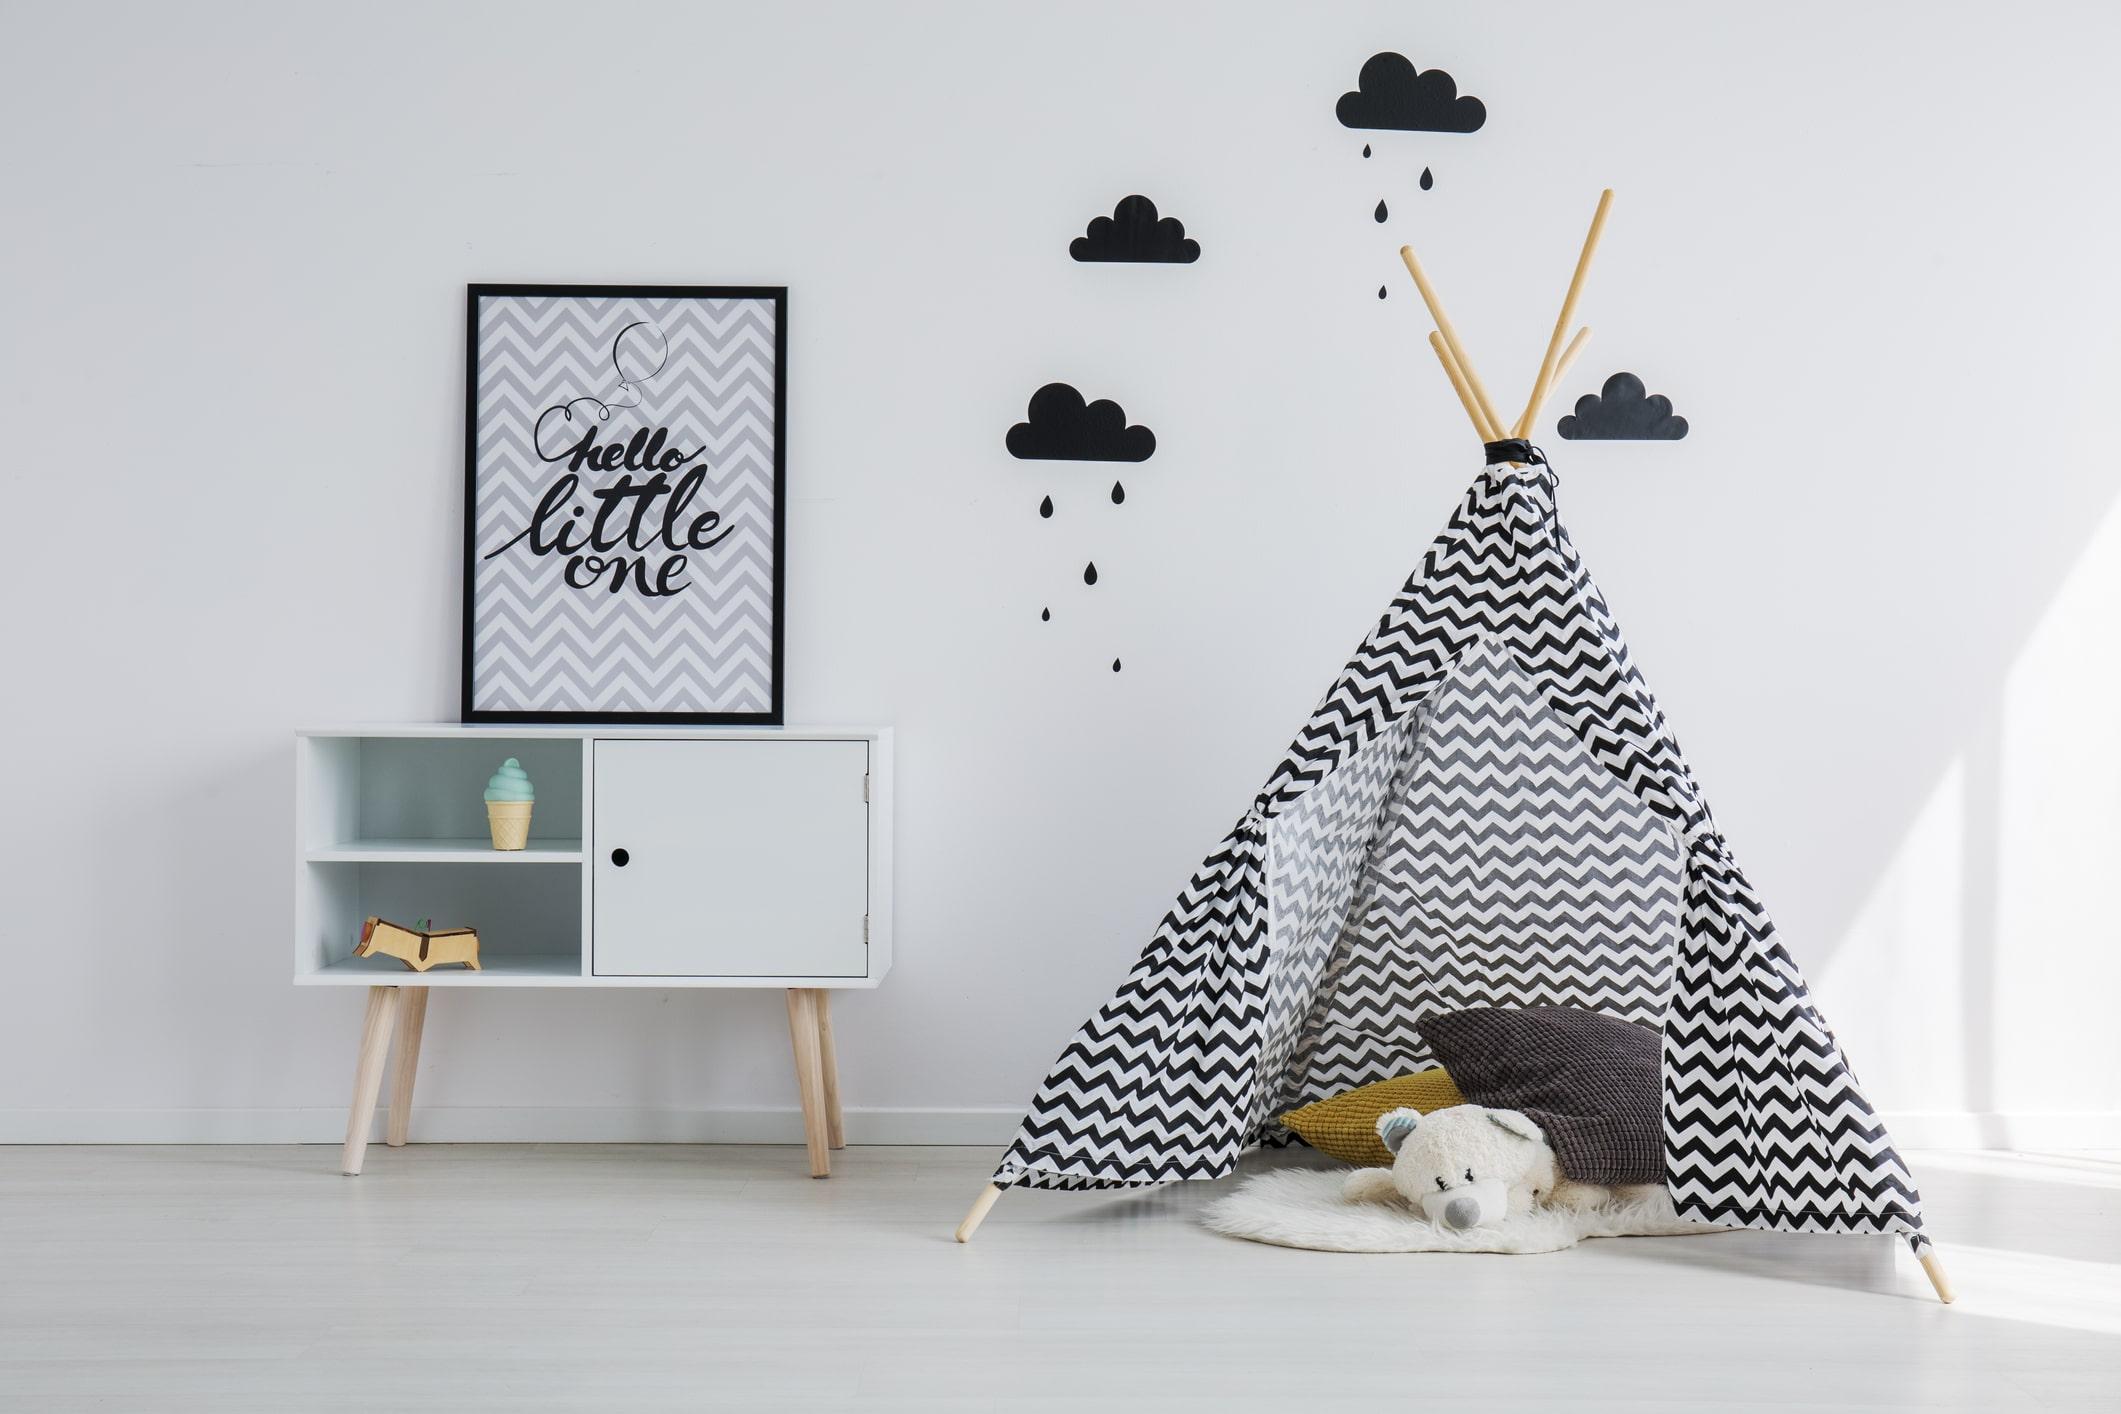 Blog kinderkamer inspiratie tipi DIY